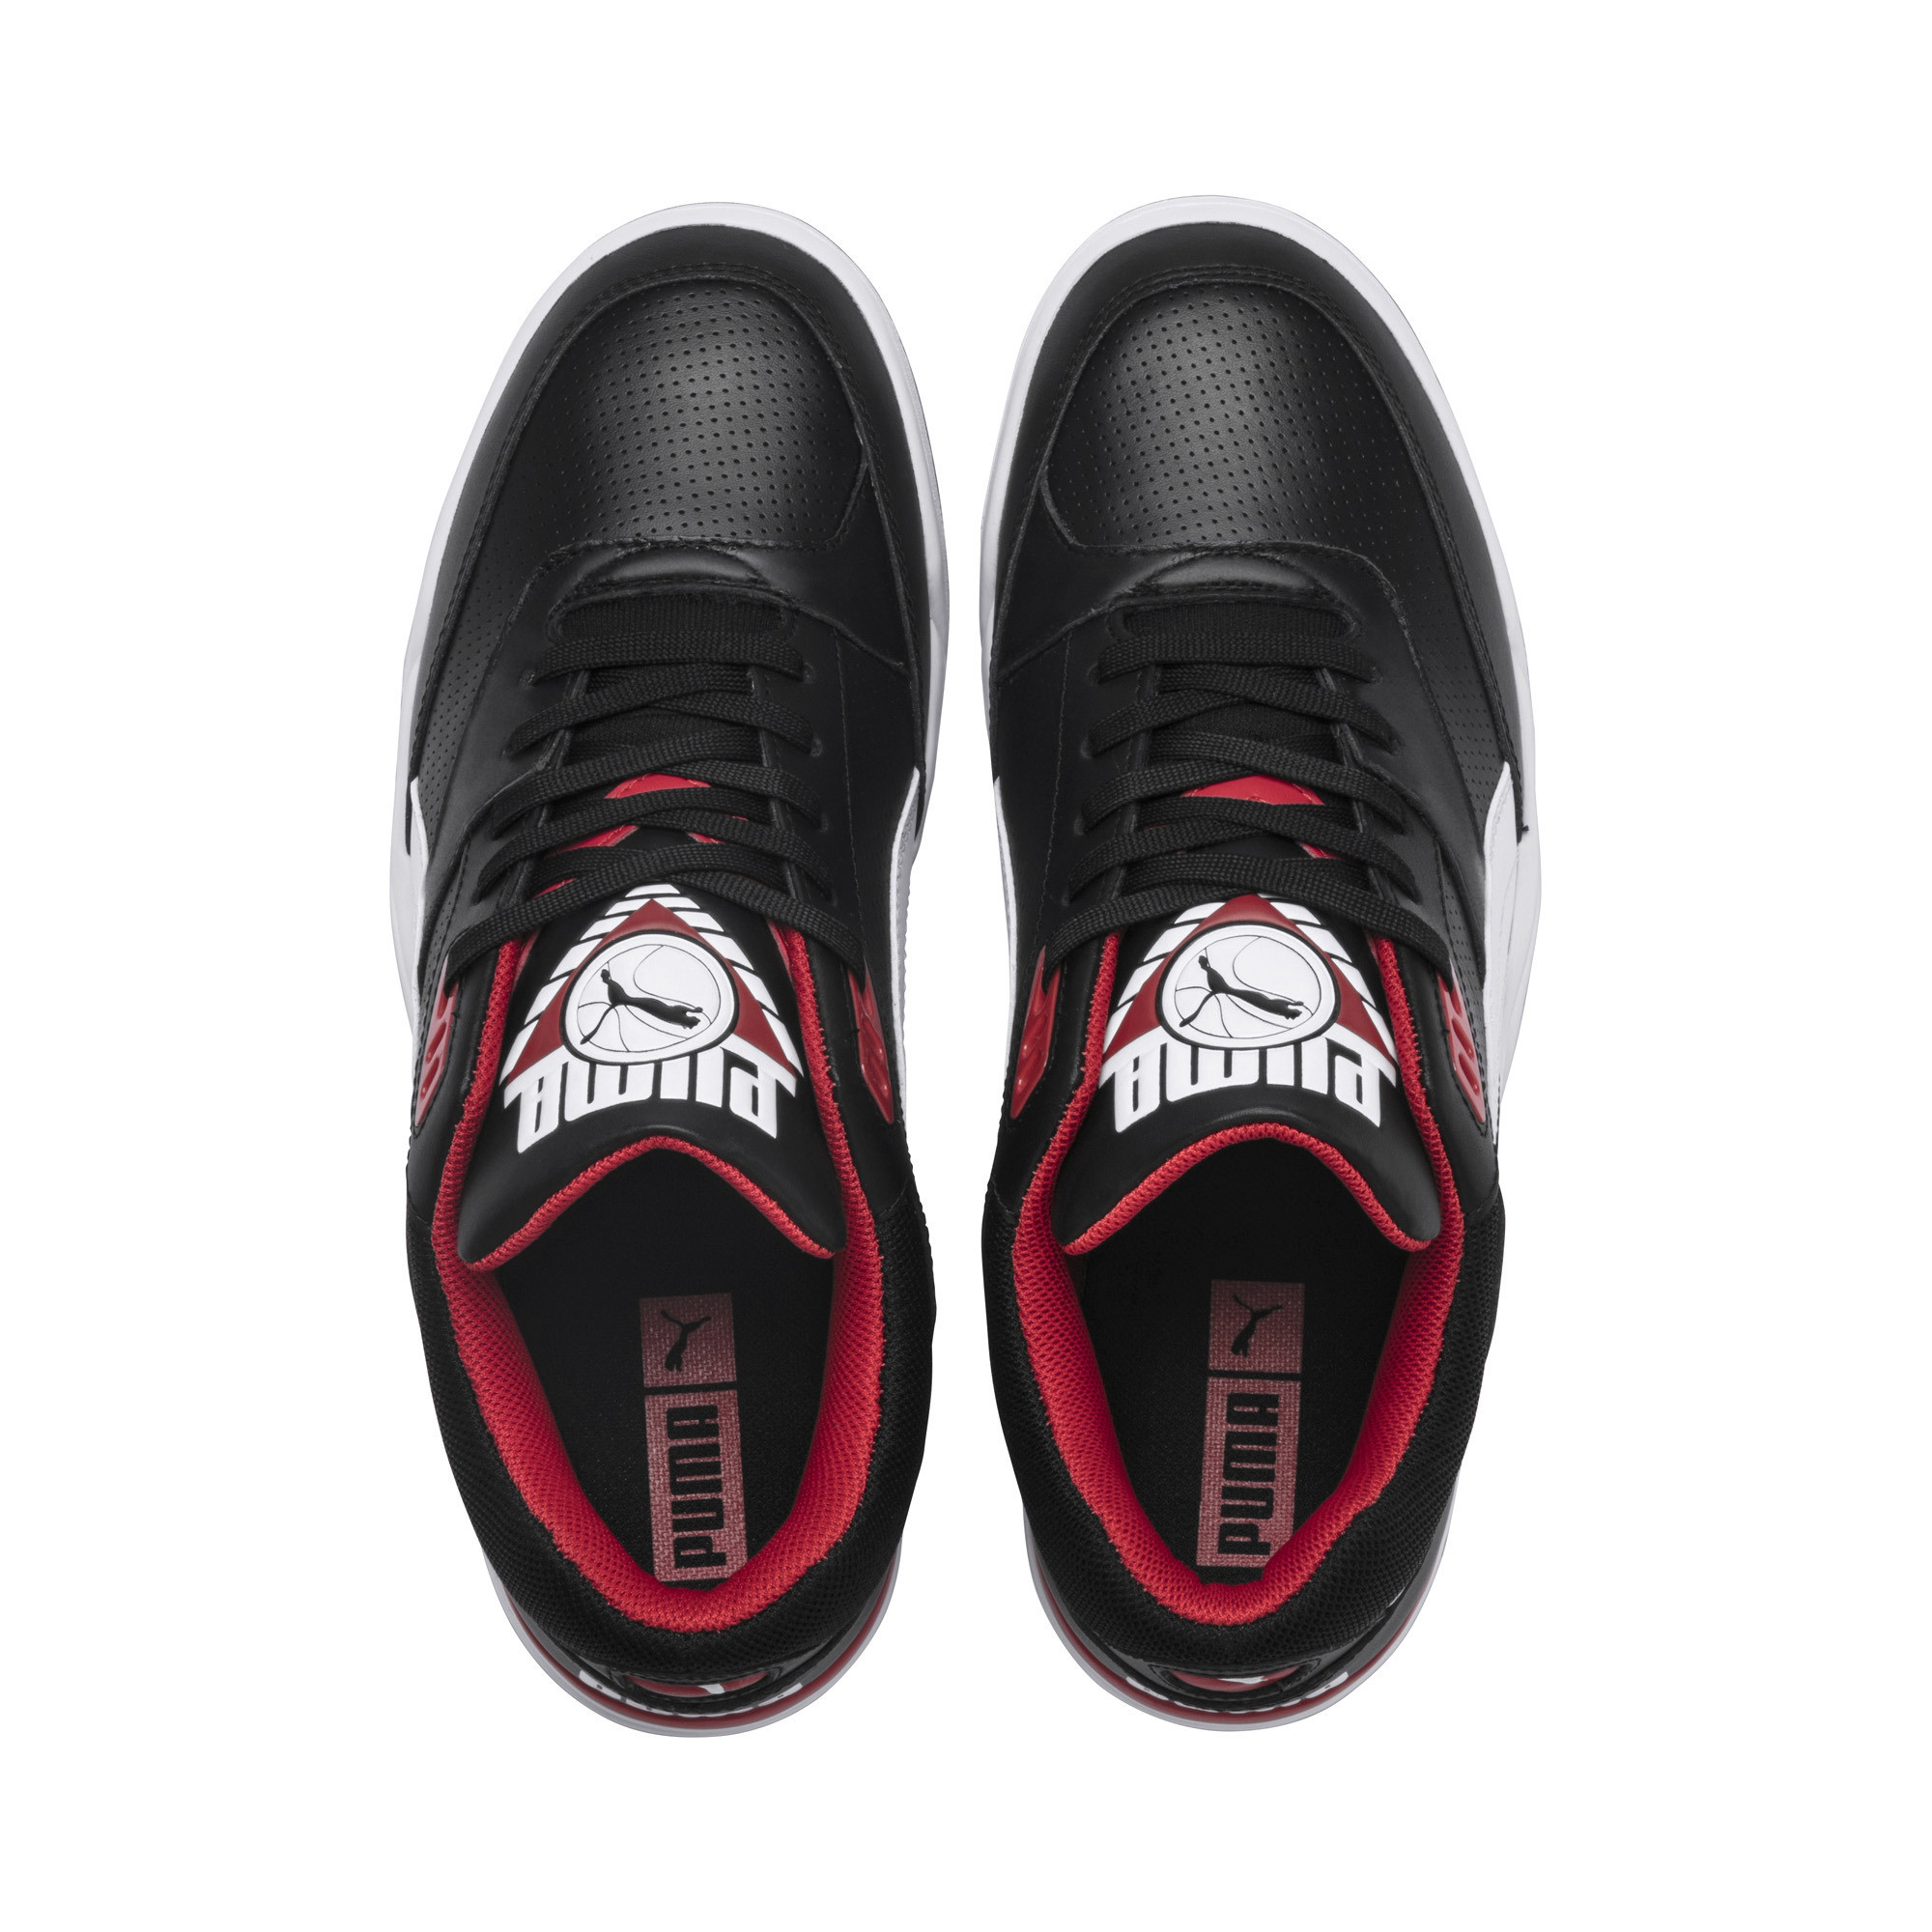 Indexbild 13 - PUMA Palace Guard Sneaker Unisex Schuhe Sport Classics Neu